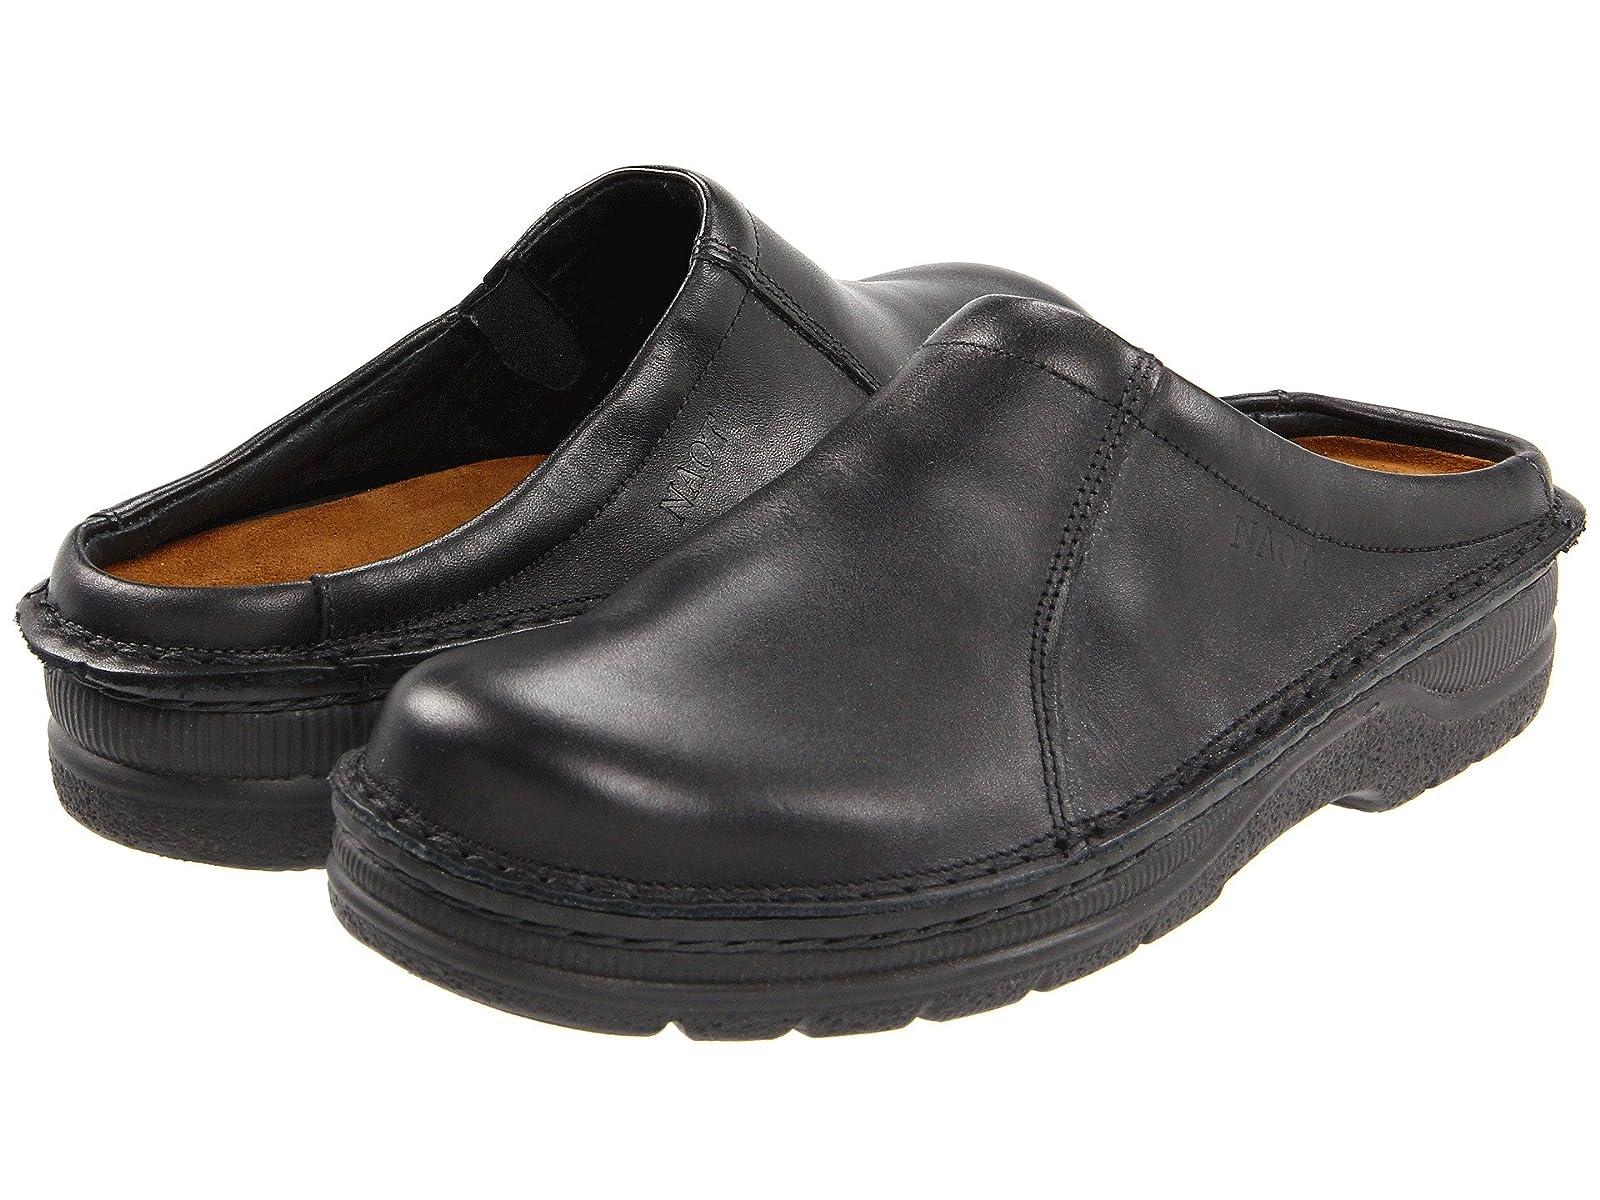 Naot BjornAtmospheric grades have affordable shoes